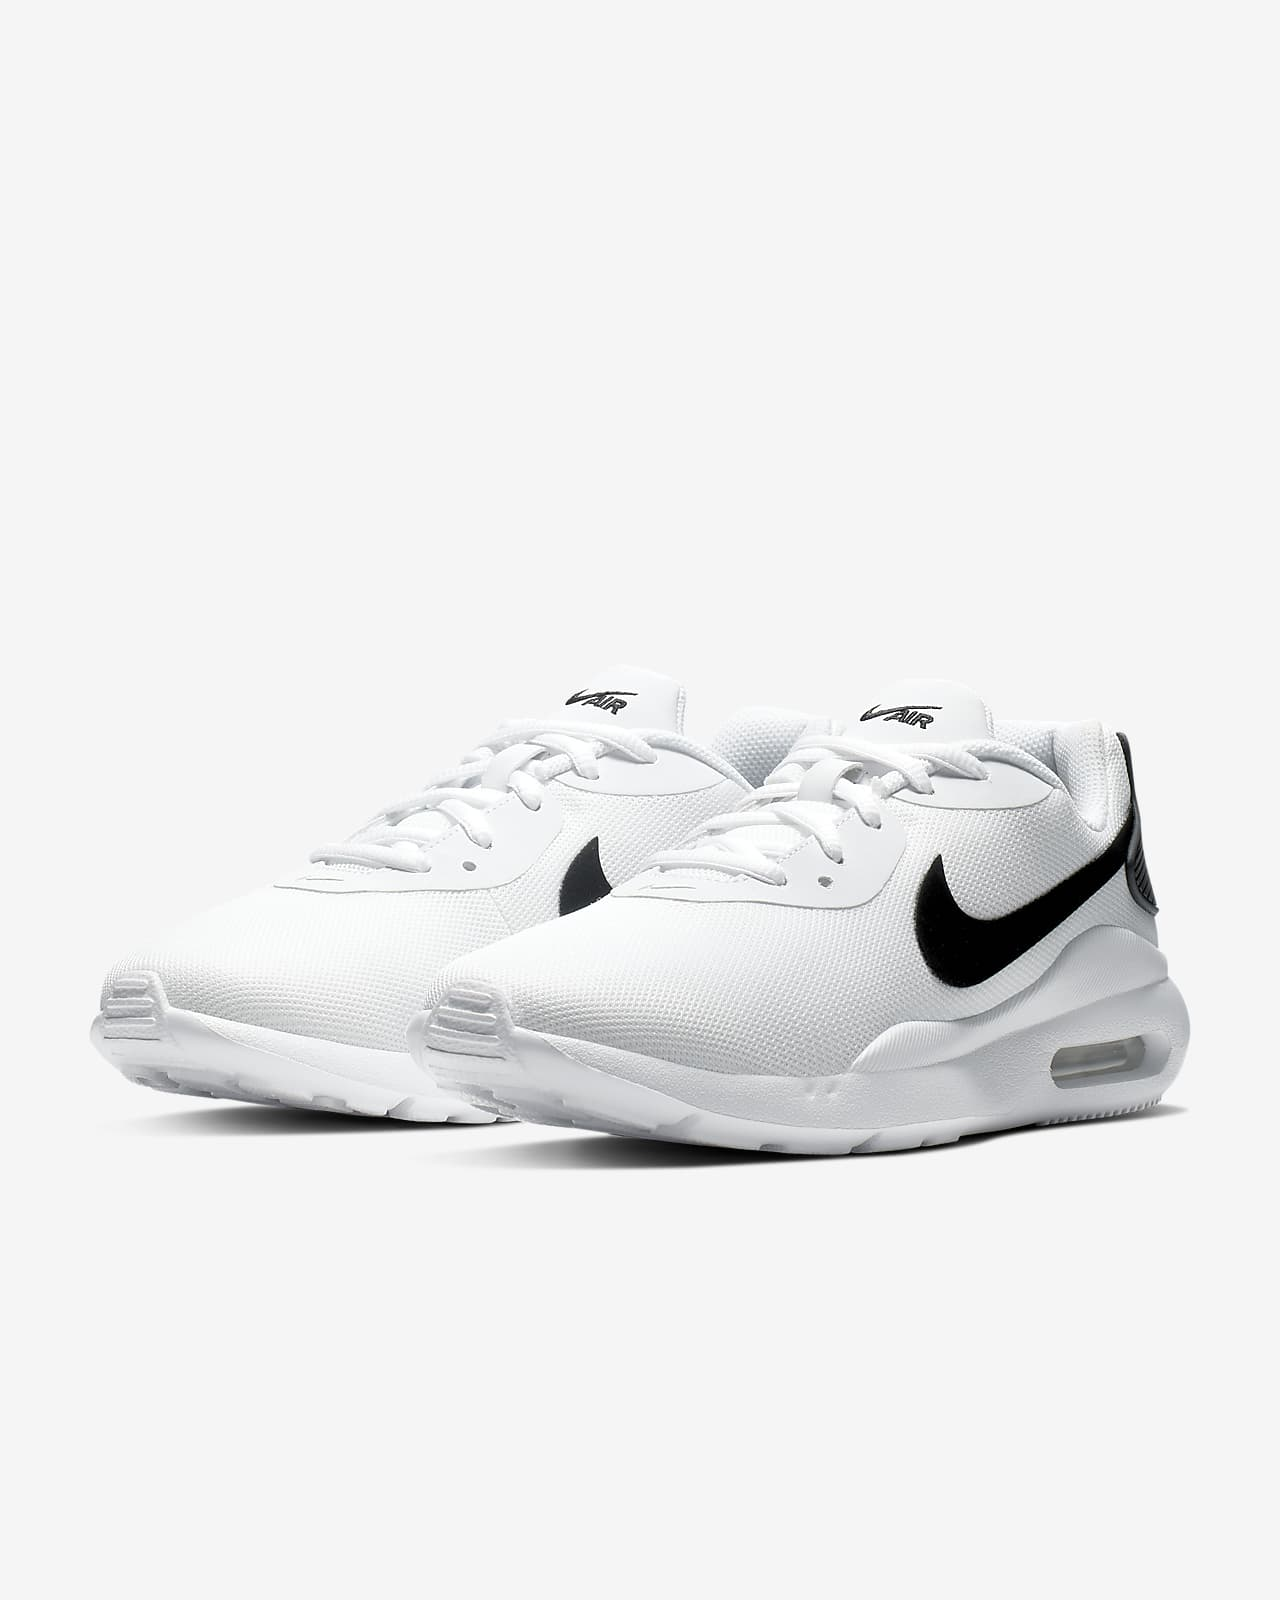 Nike Air Max Oketo Women's Shoe. Nike FI